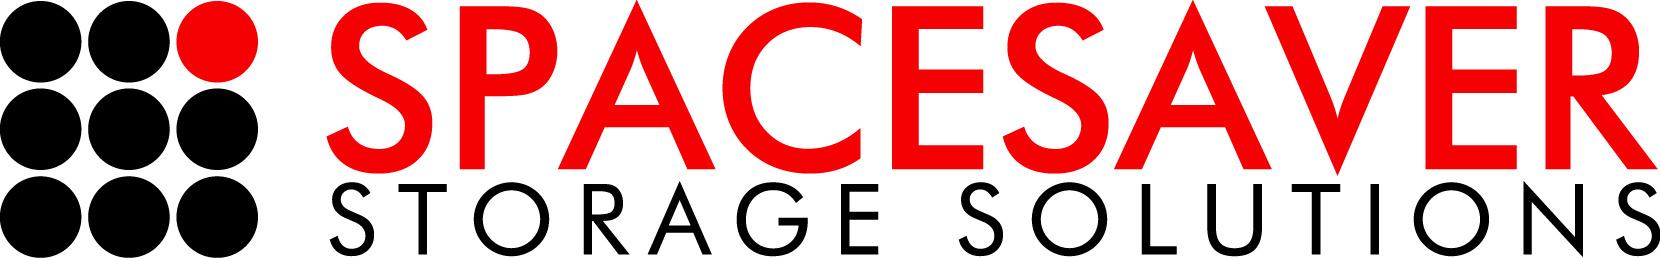 spacesaver_storage_solutions_logo